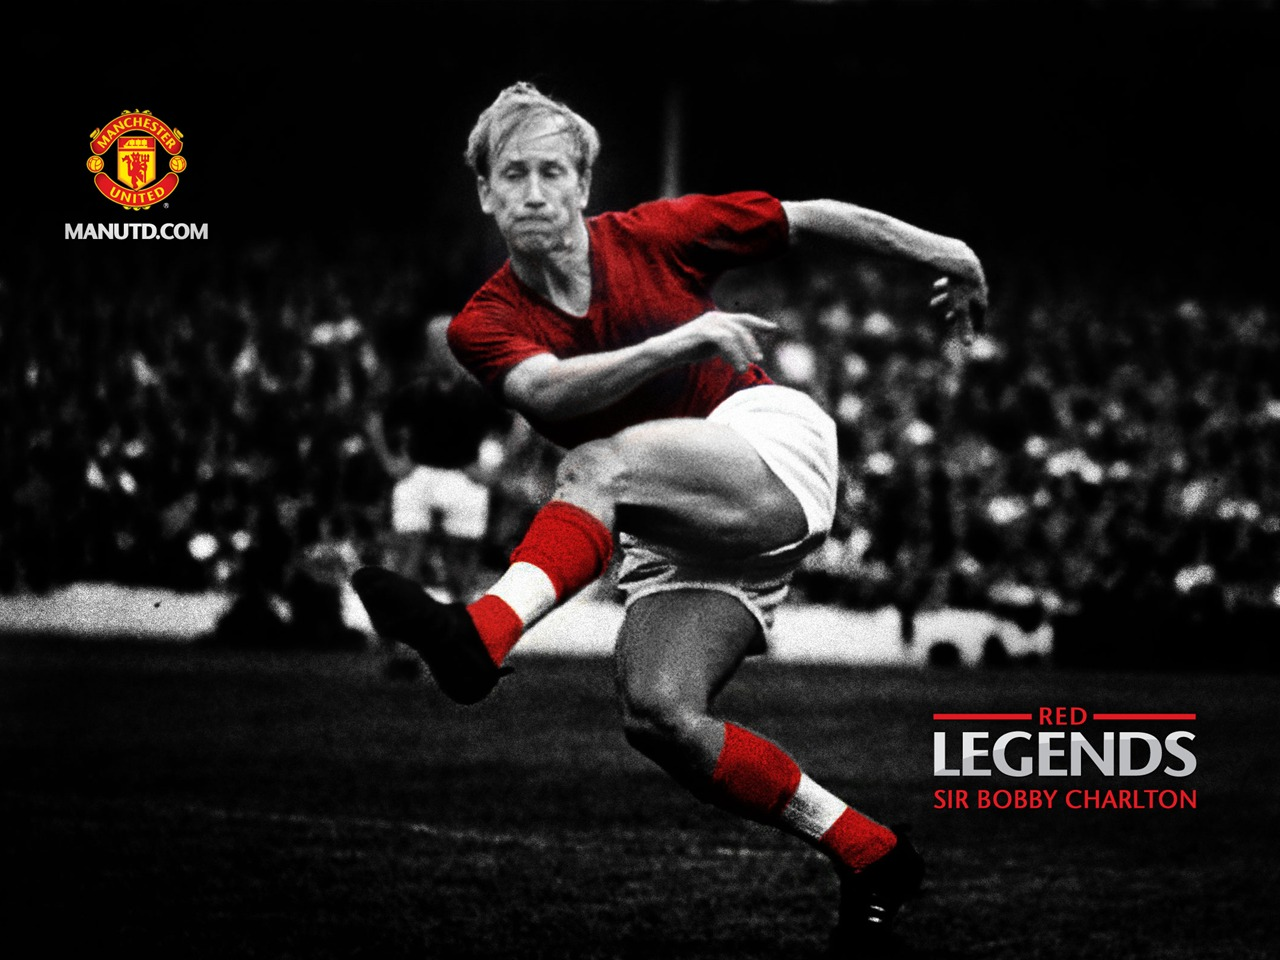 Sir Bobby Charlton Red Legends Manchester United Wallpaper